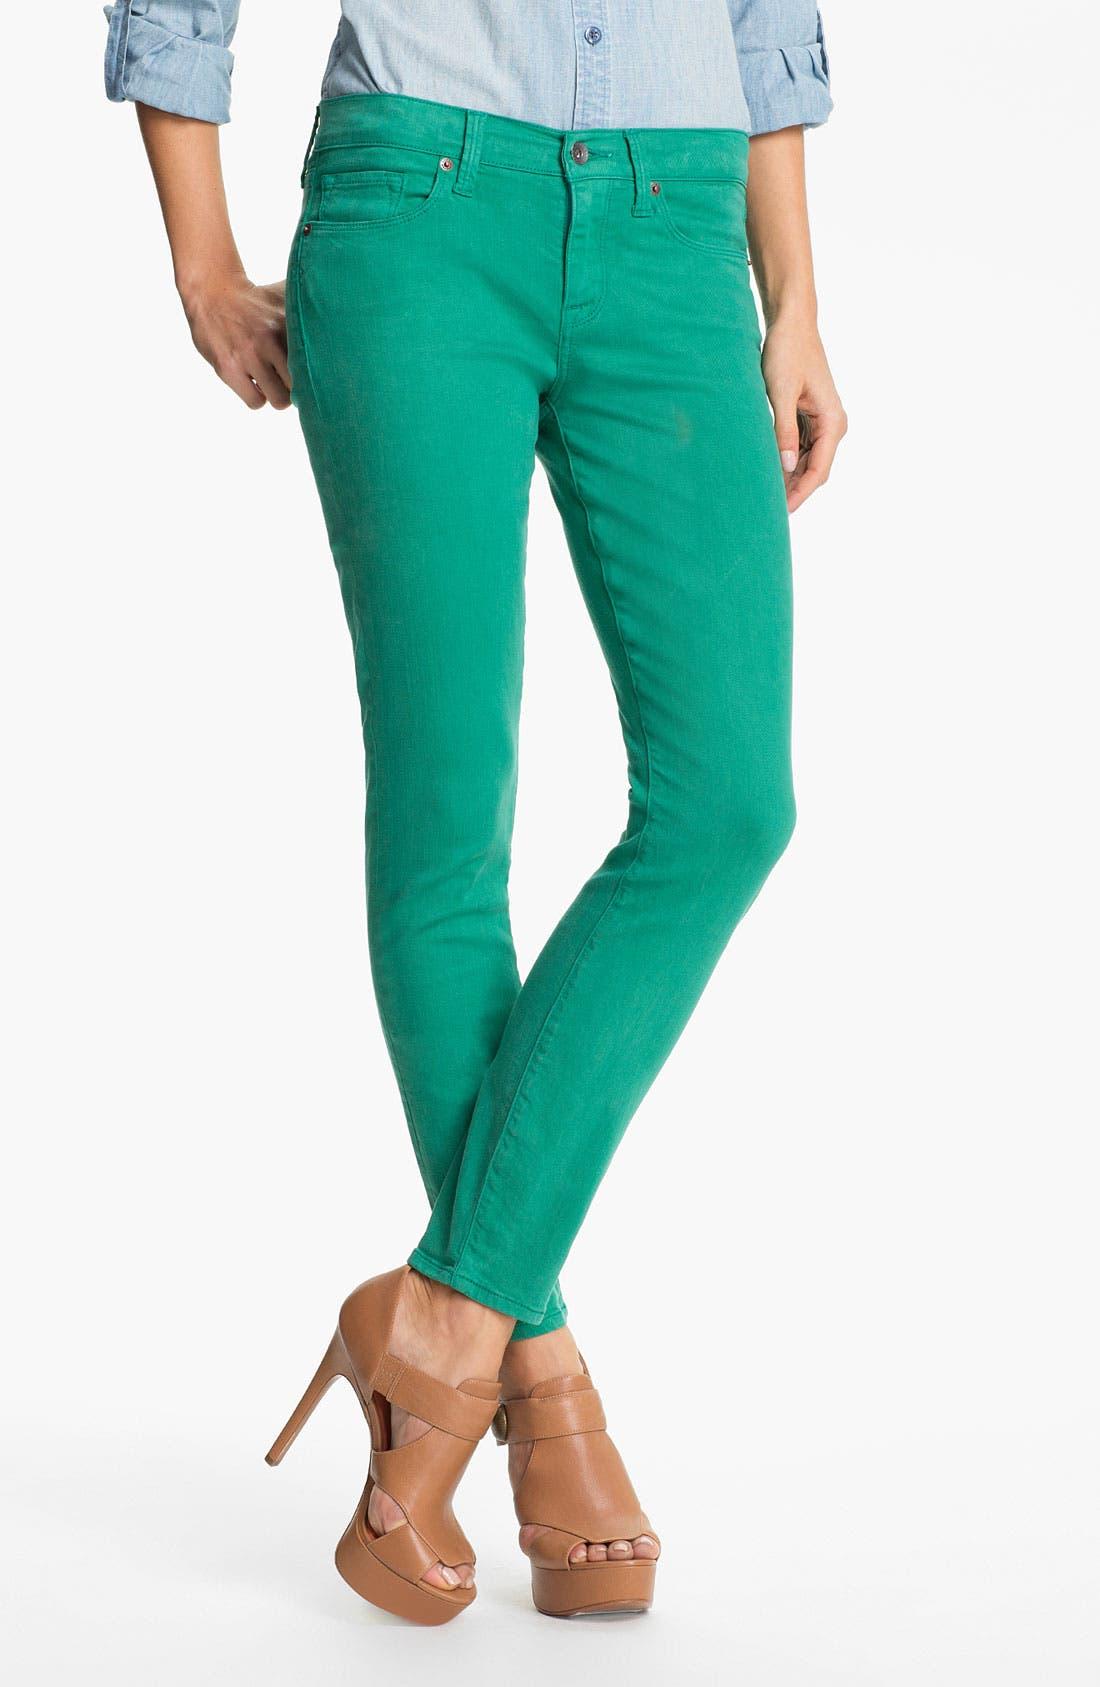 Main Image - Lucky Brand 'Sofia' Colored Denim Skinny Jeans